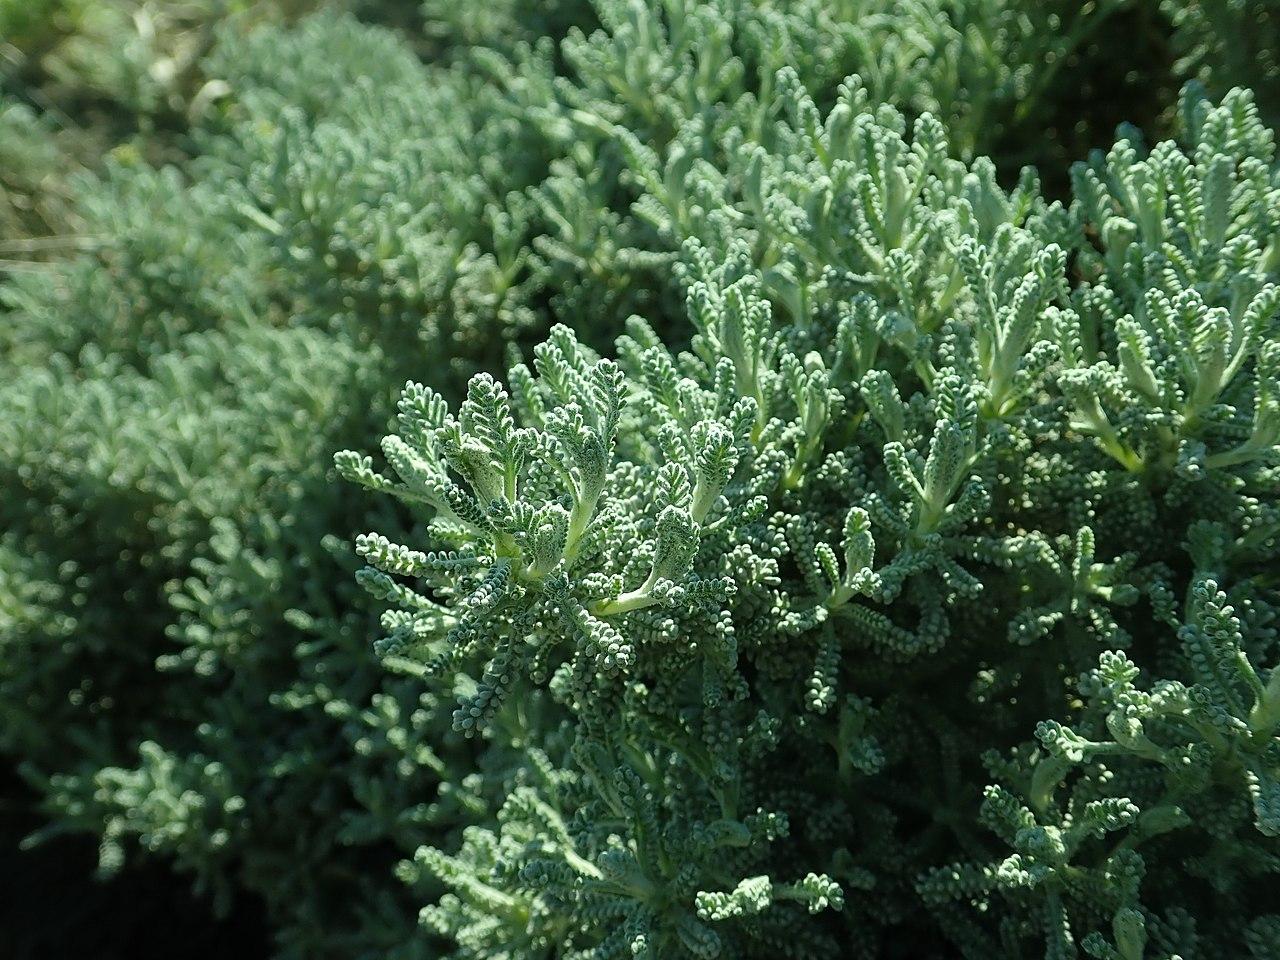 La Santolina rosmarinifolia es una planta perenne